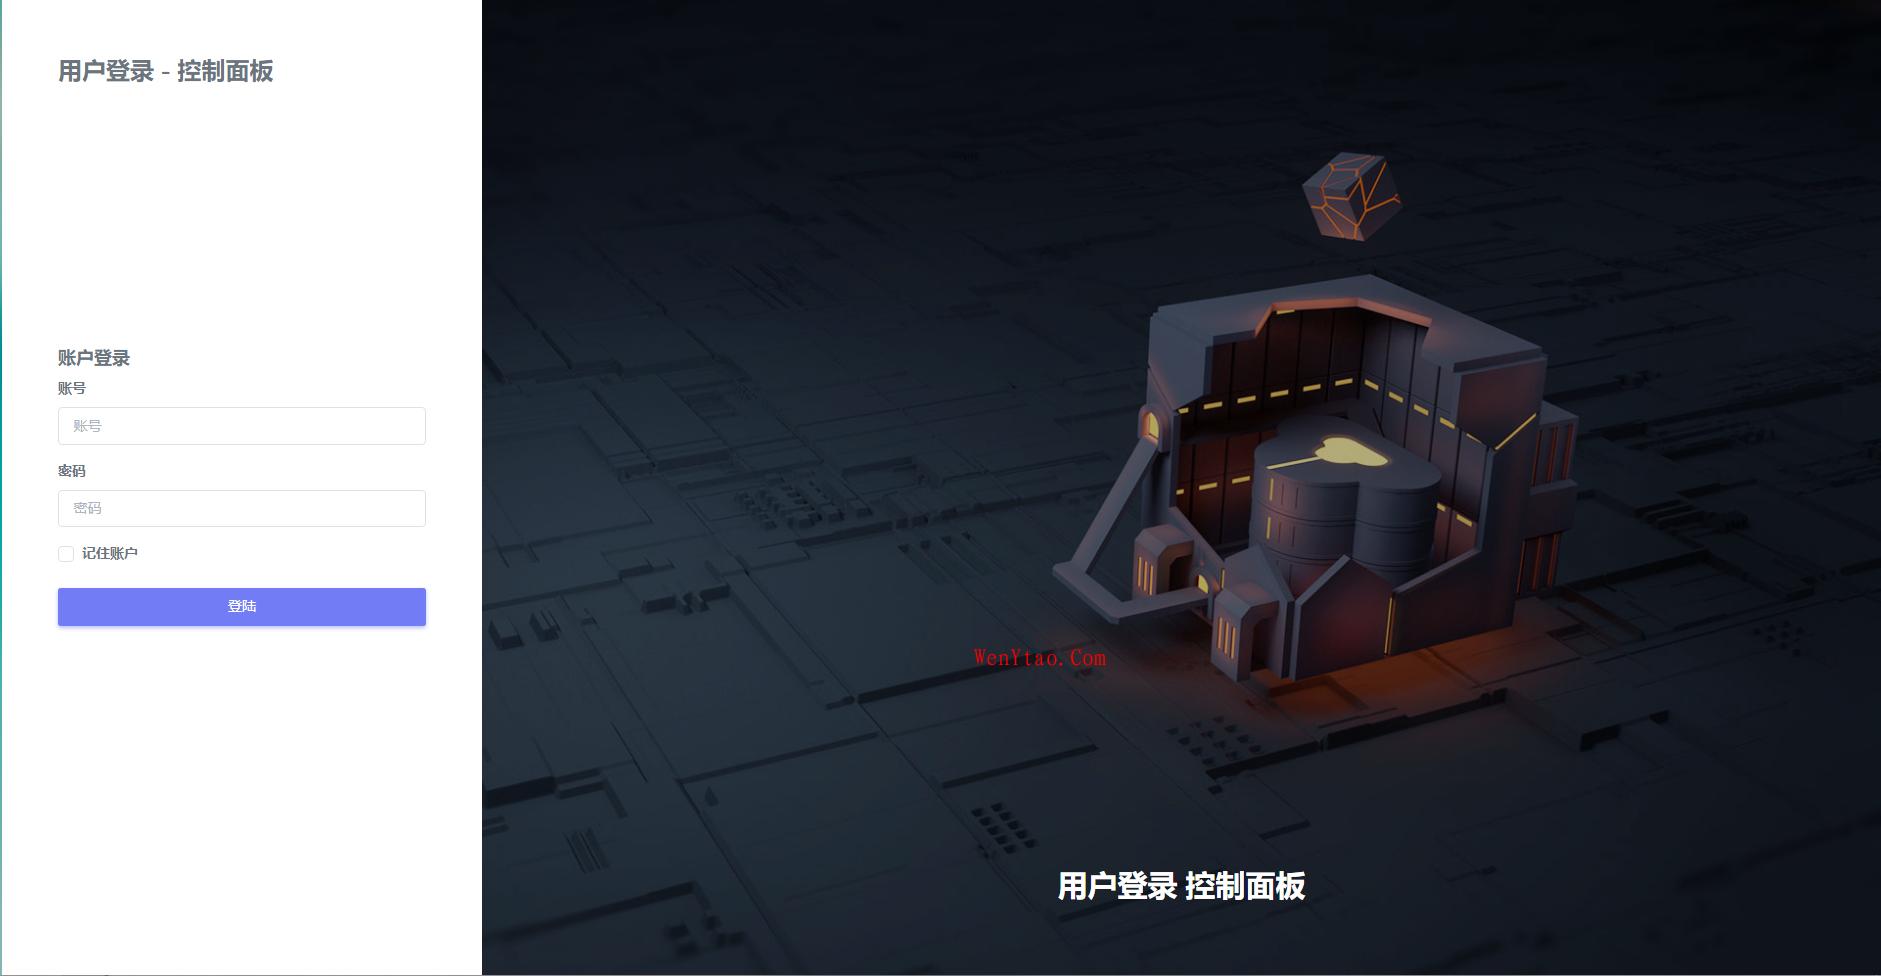 New Cloud - Kangle脚本 自带精品模板+用户自定义防CC 第1张